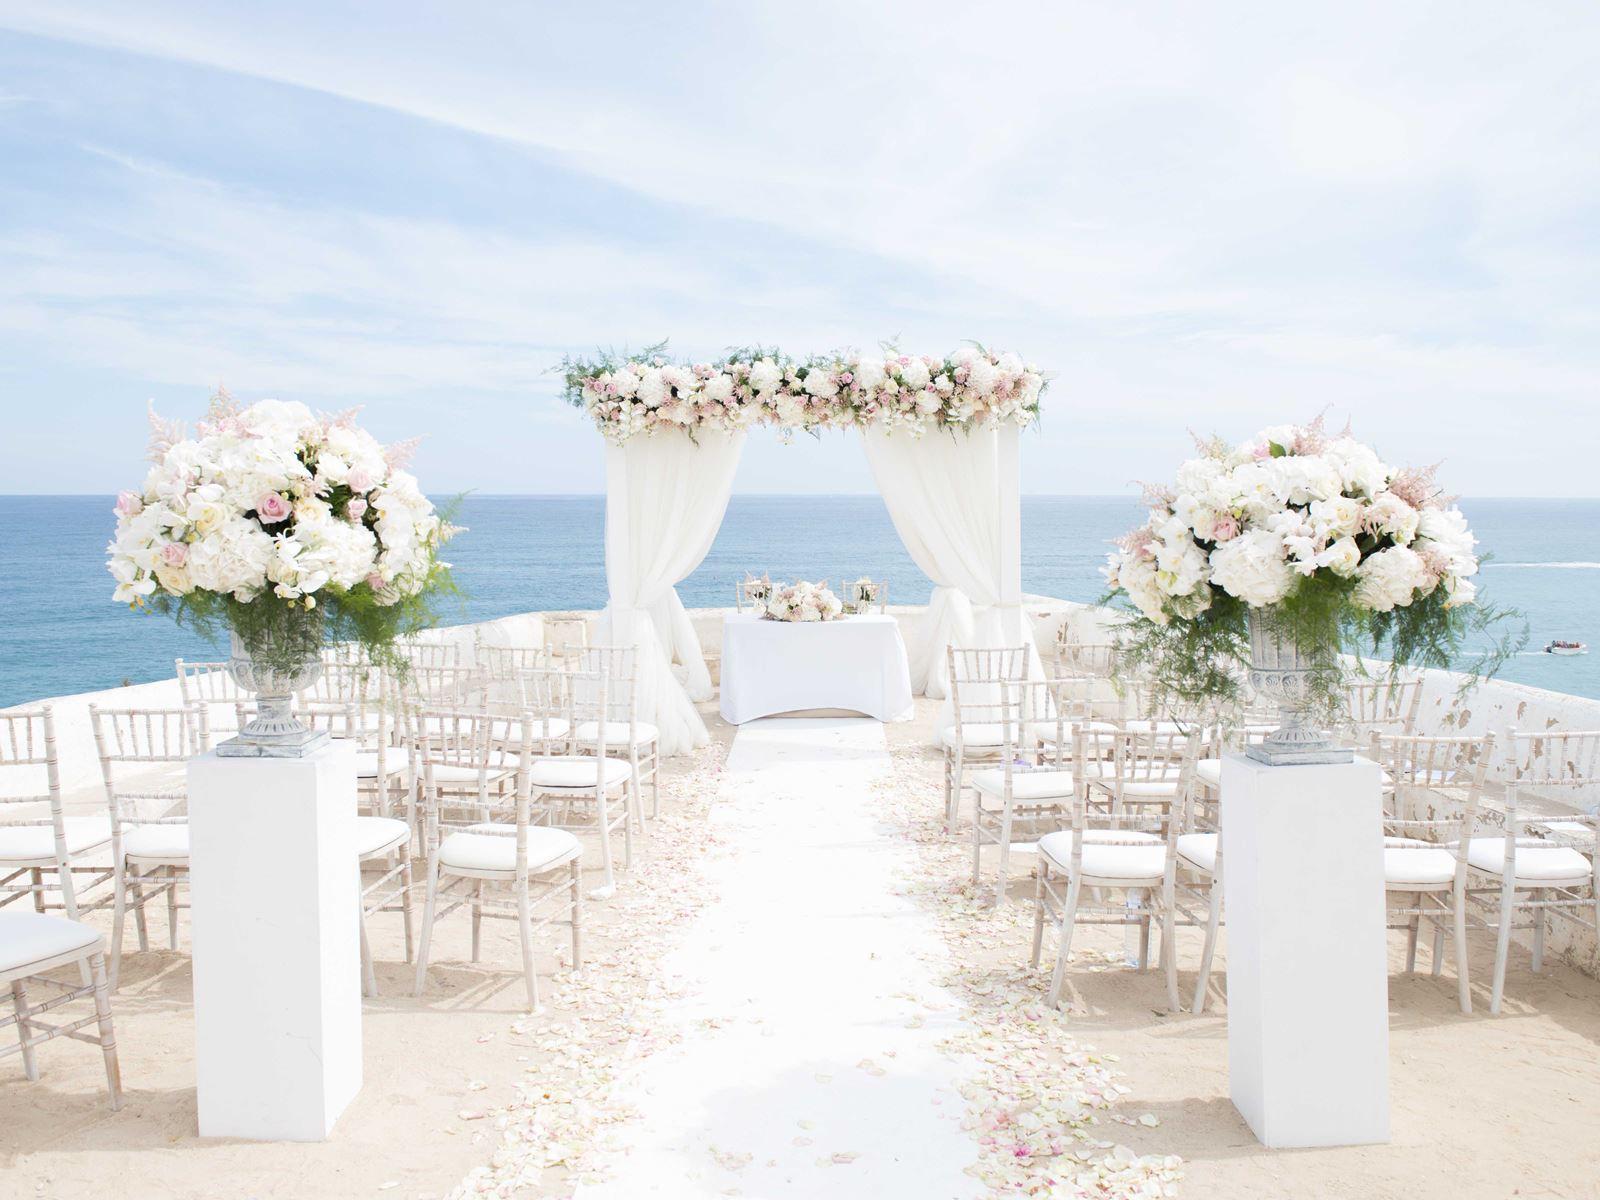 Ceremony Locations - Rebecca Woodhall Wedding Planner, Designer ...